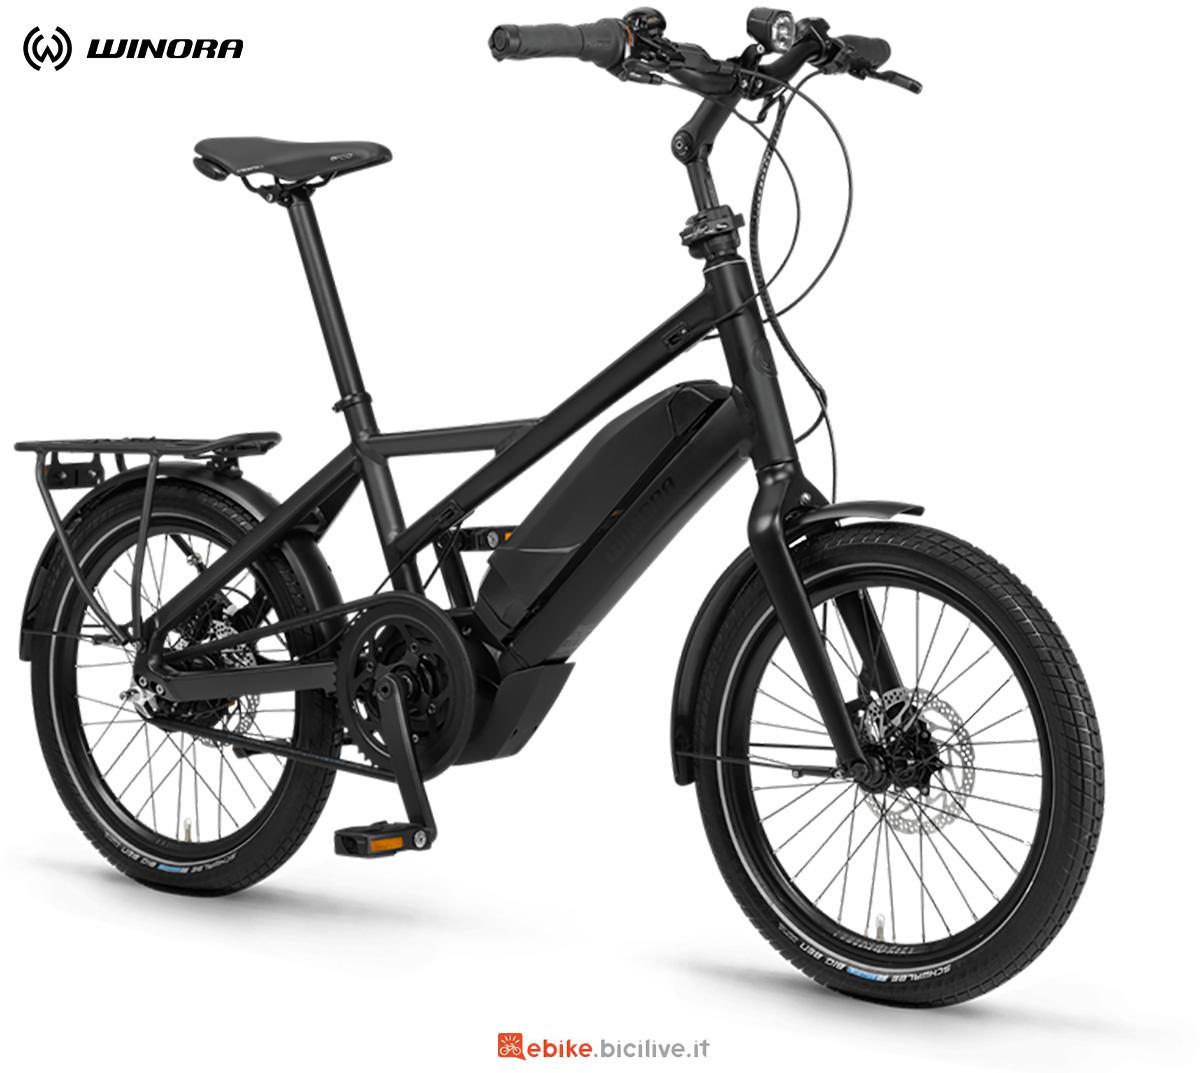 La nuova bici elettrica urbana Winora Radius Tour 2021